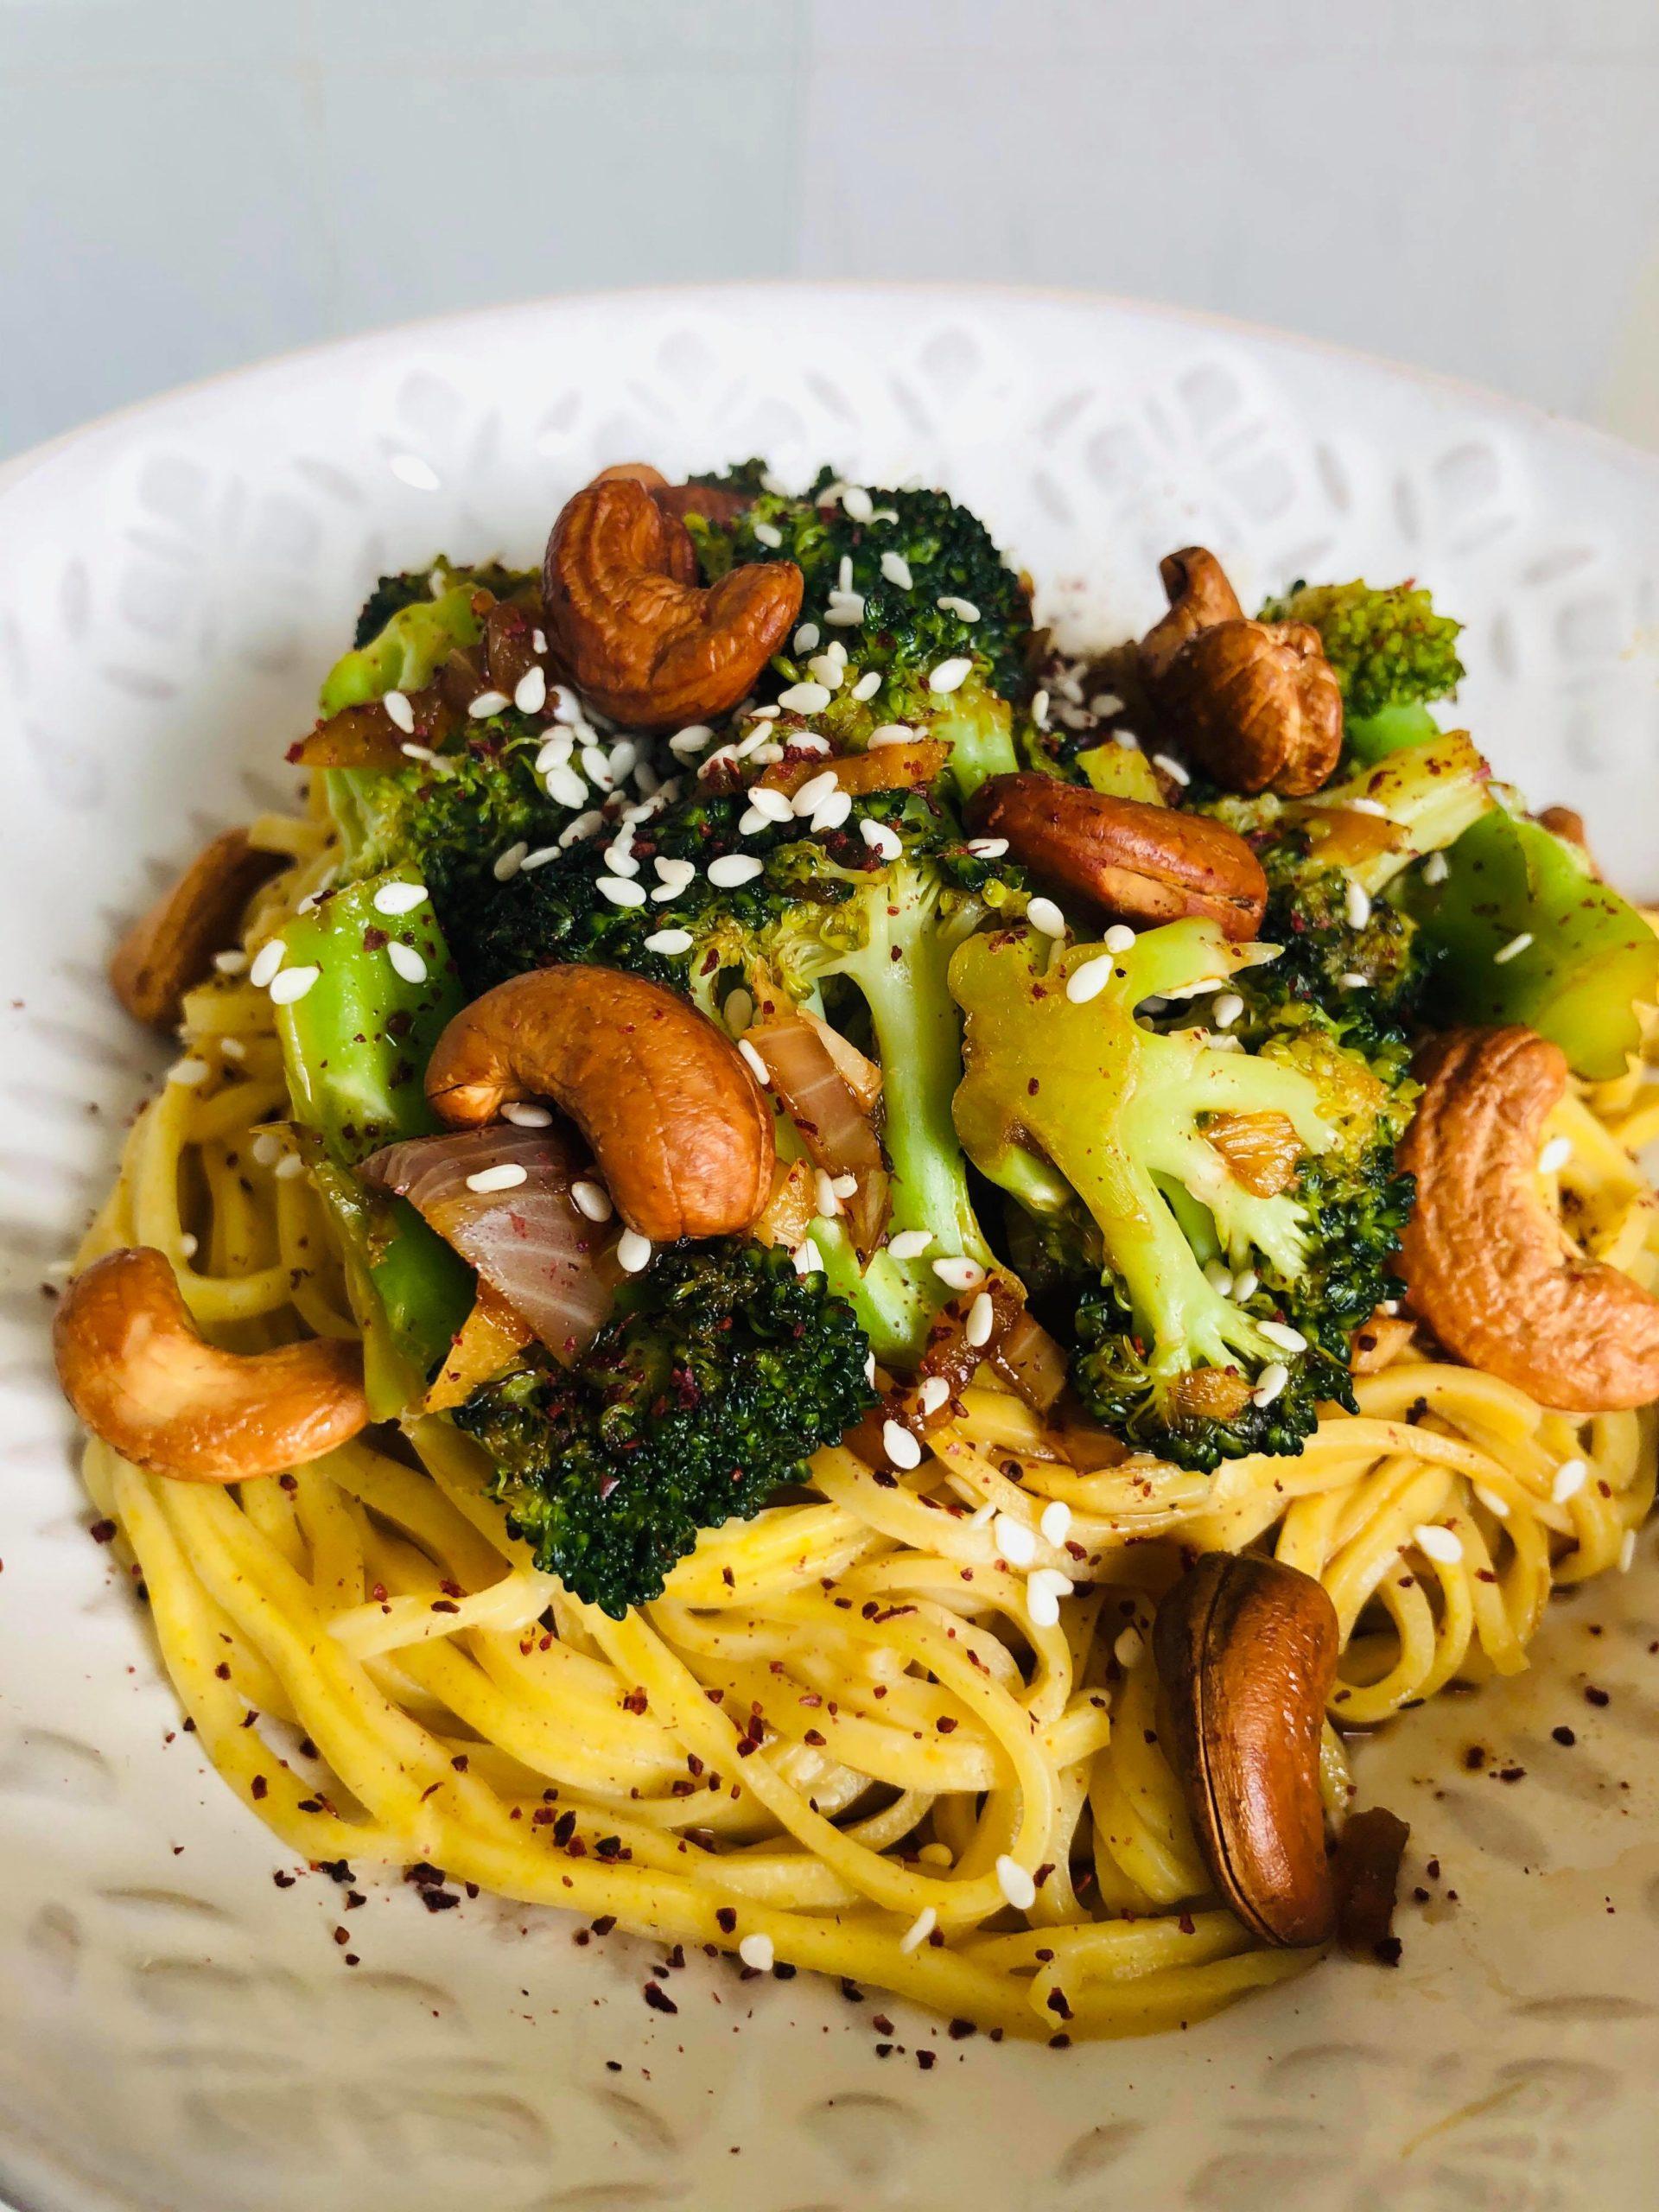 20-Minute Healthy Broccoli Cashew Stir-Fry